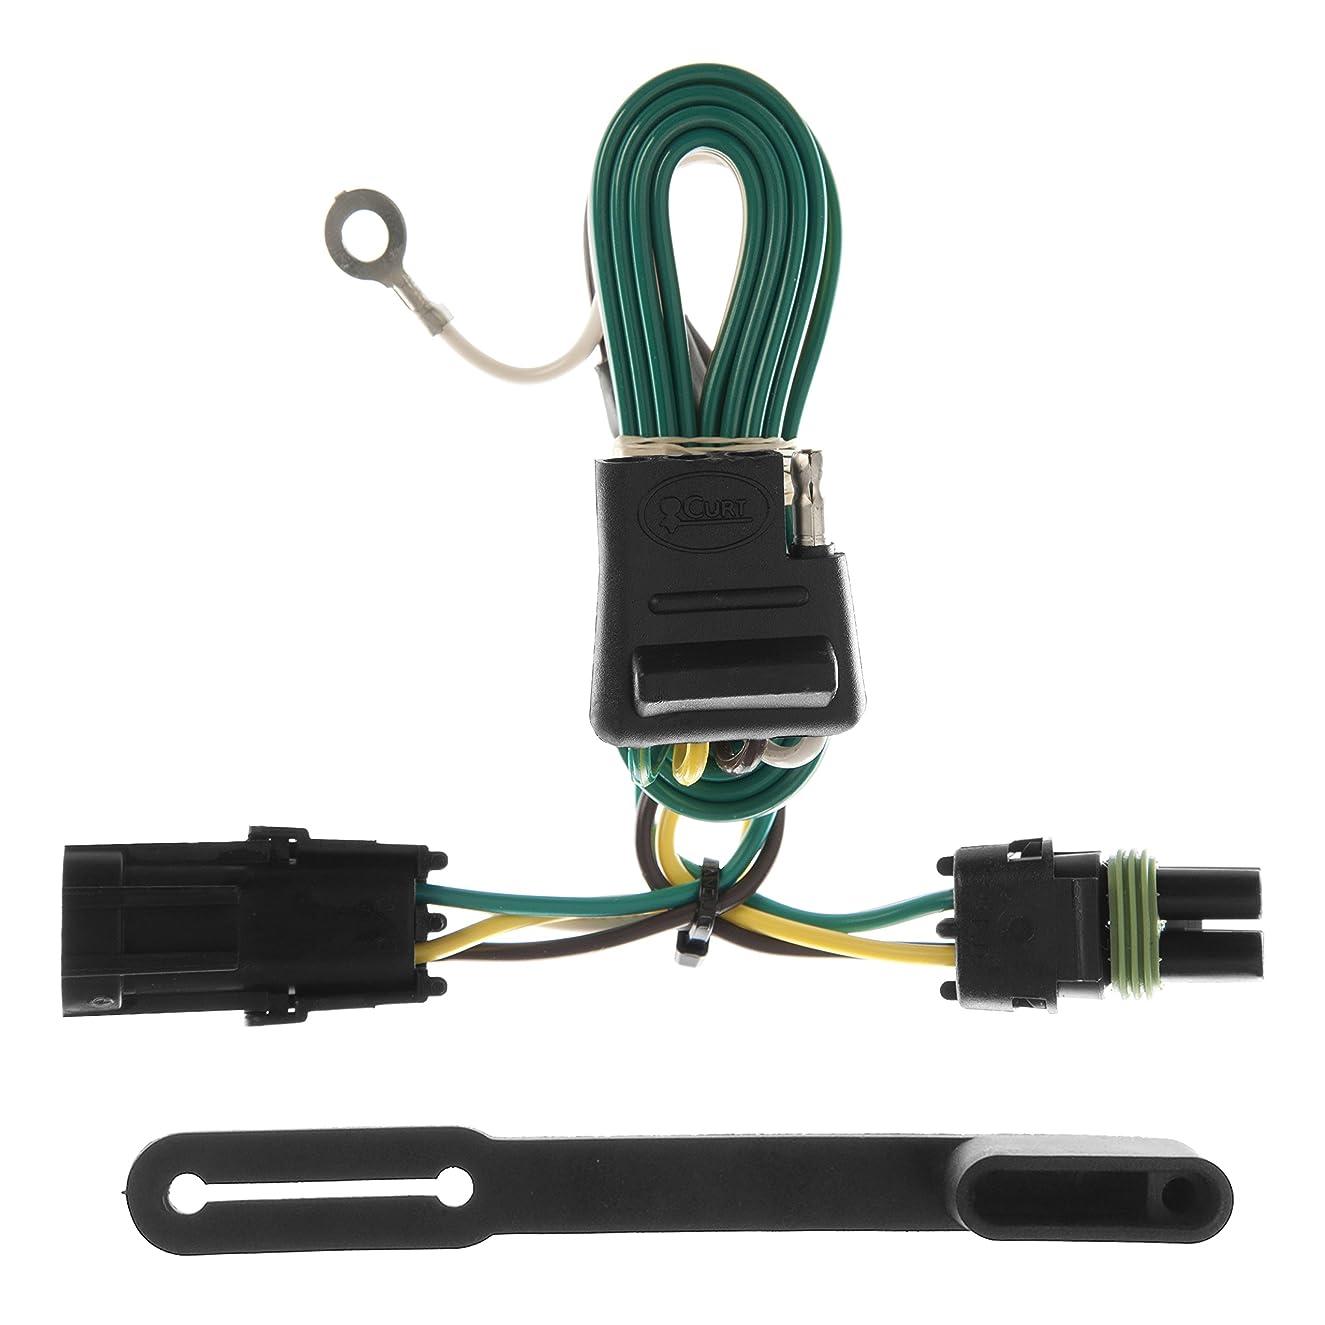 CURT 55312 Vehicle-Side Custom 4-Pin Trailer Wiring Harness for Select Chevrolet, GMC Pickup Trucks, SUVs